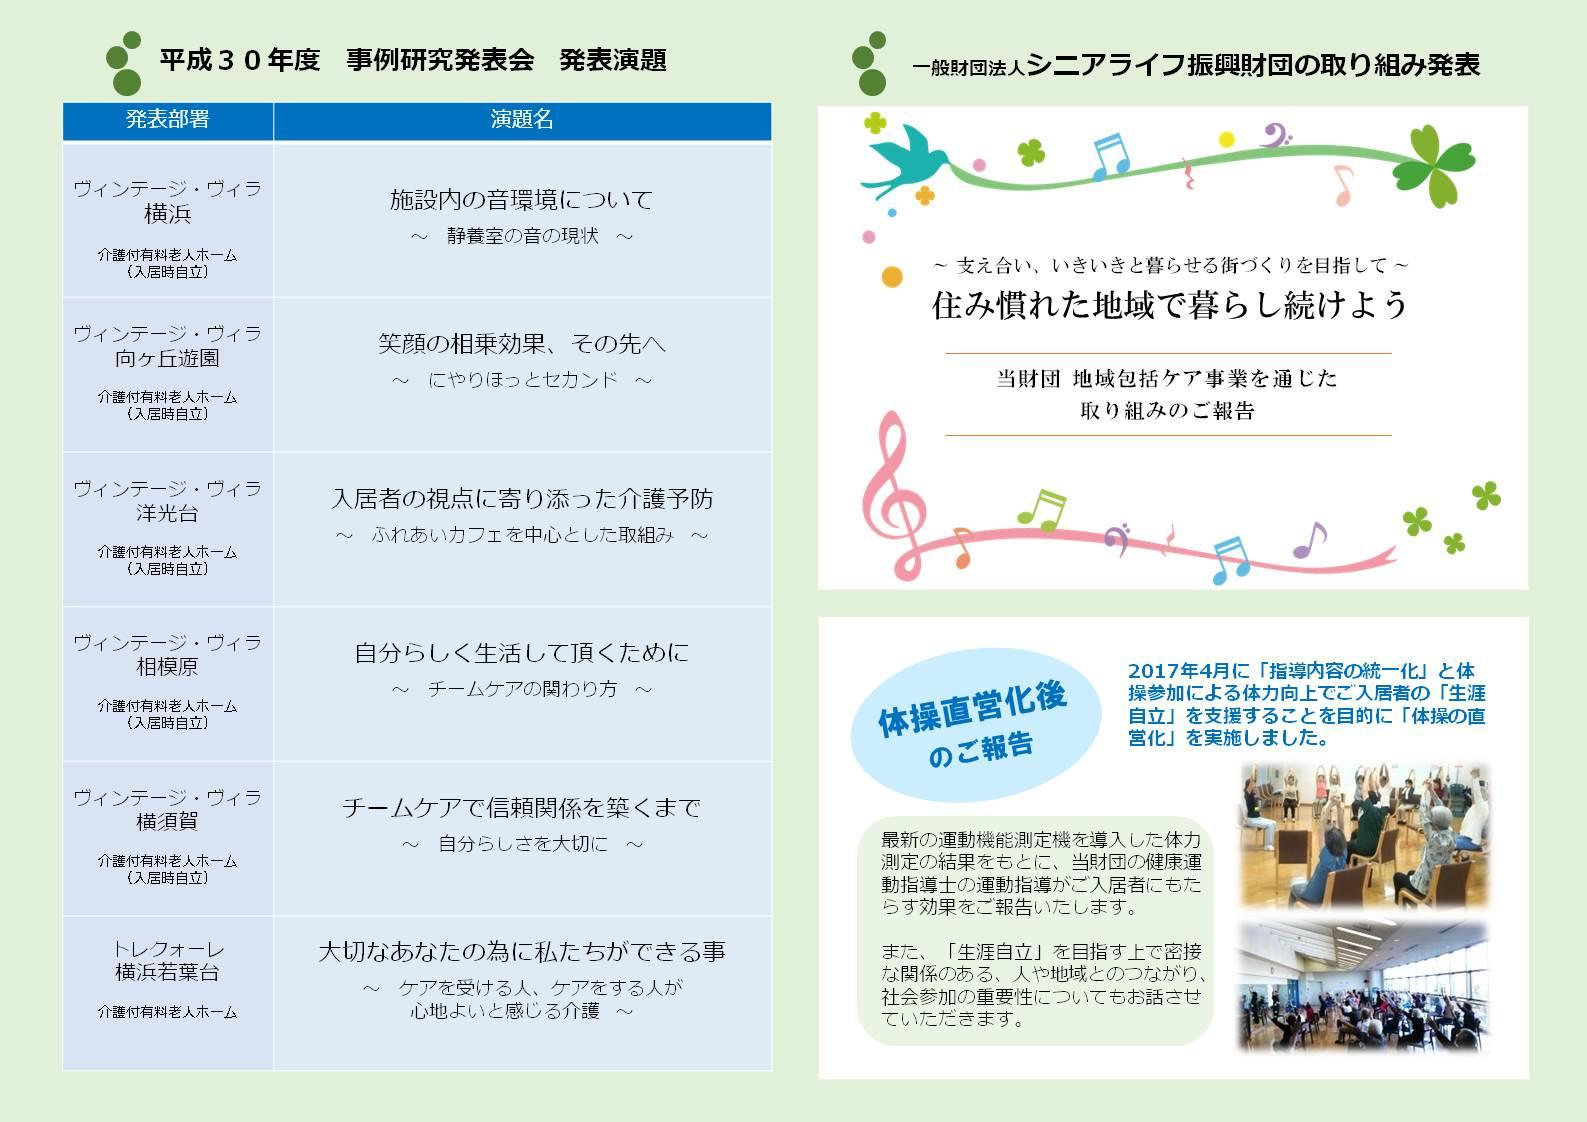 Case study presentation181019_2.JPG